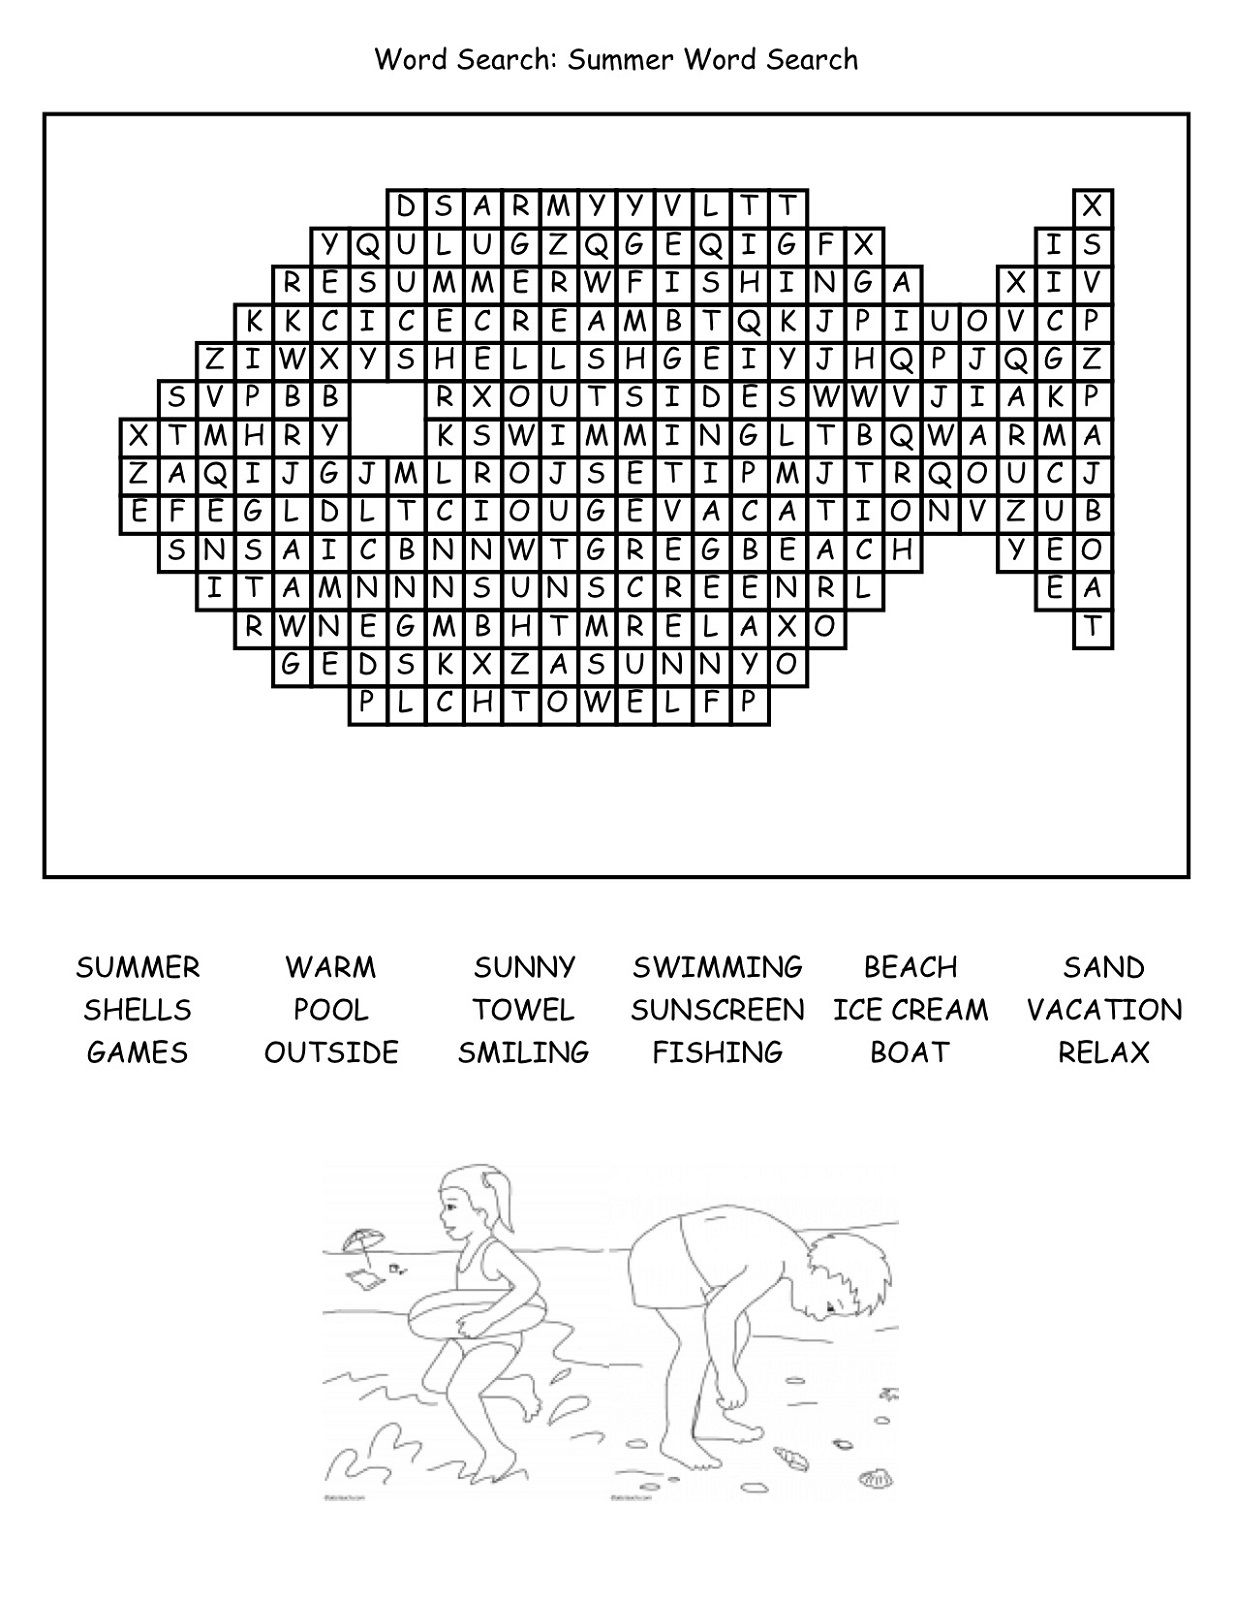 image regarding Fun Printable Games identified as Pleasurable Printable Video games Educative Puzzle for Small children Pleasurable